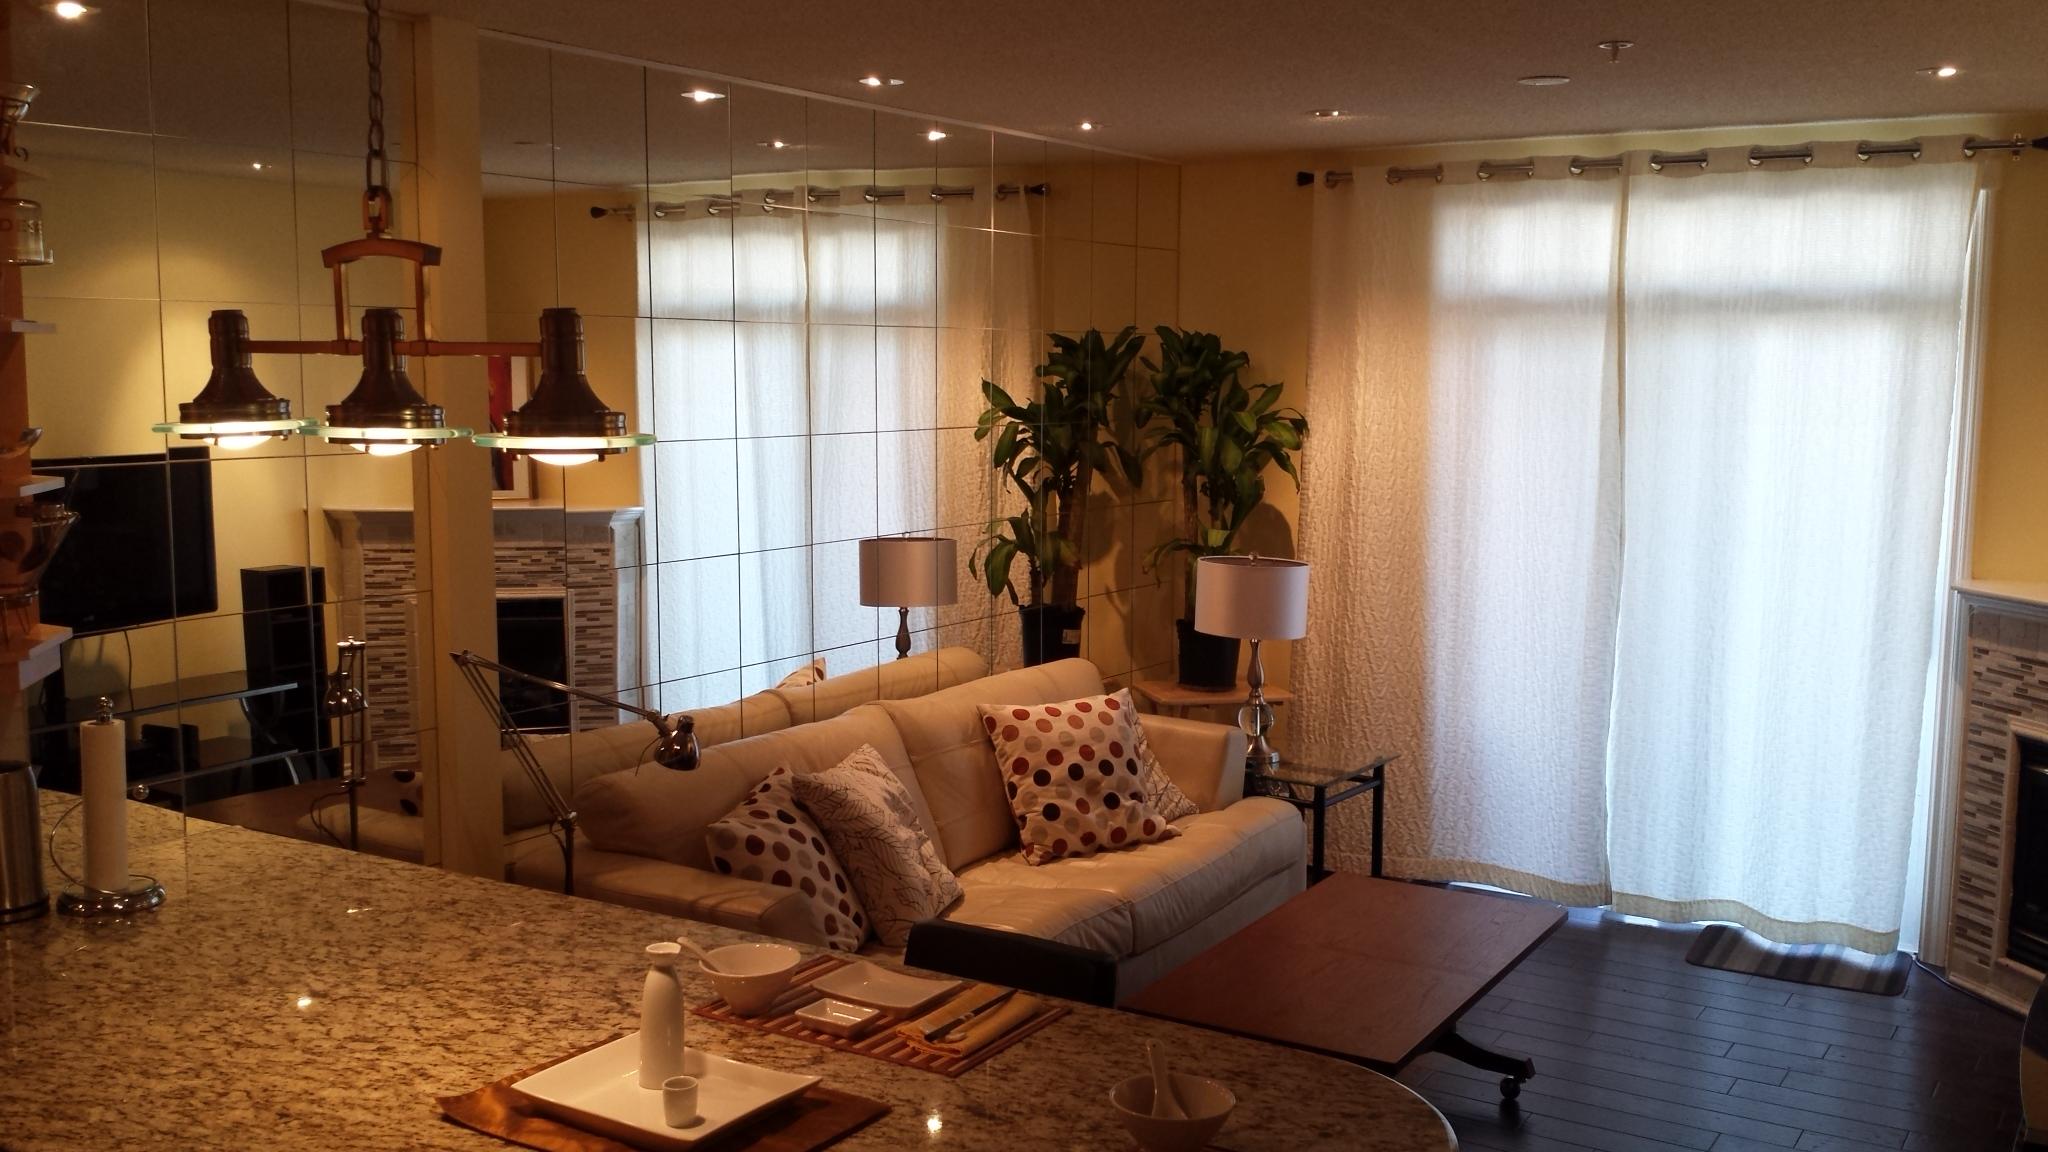 Unit 204 Living Room 2